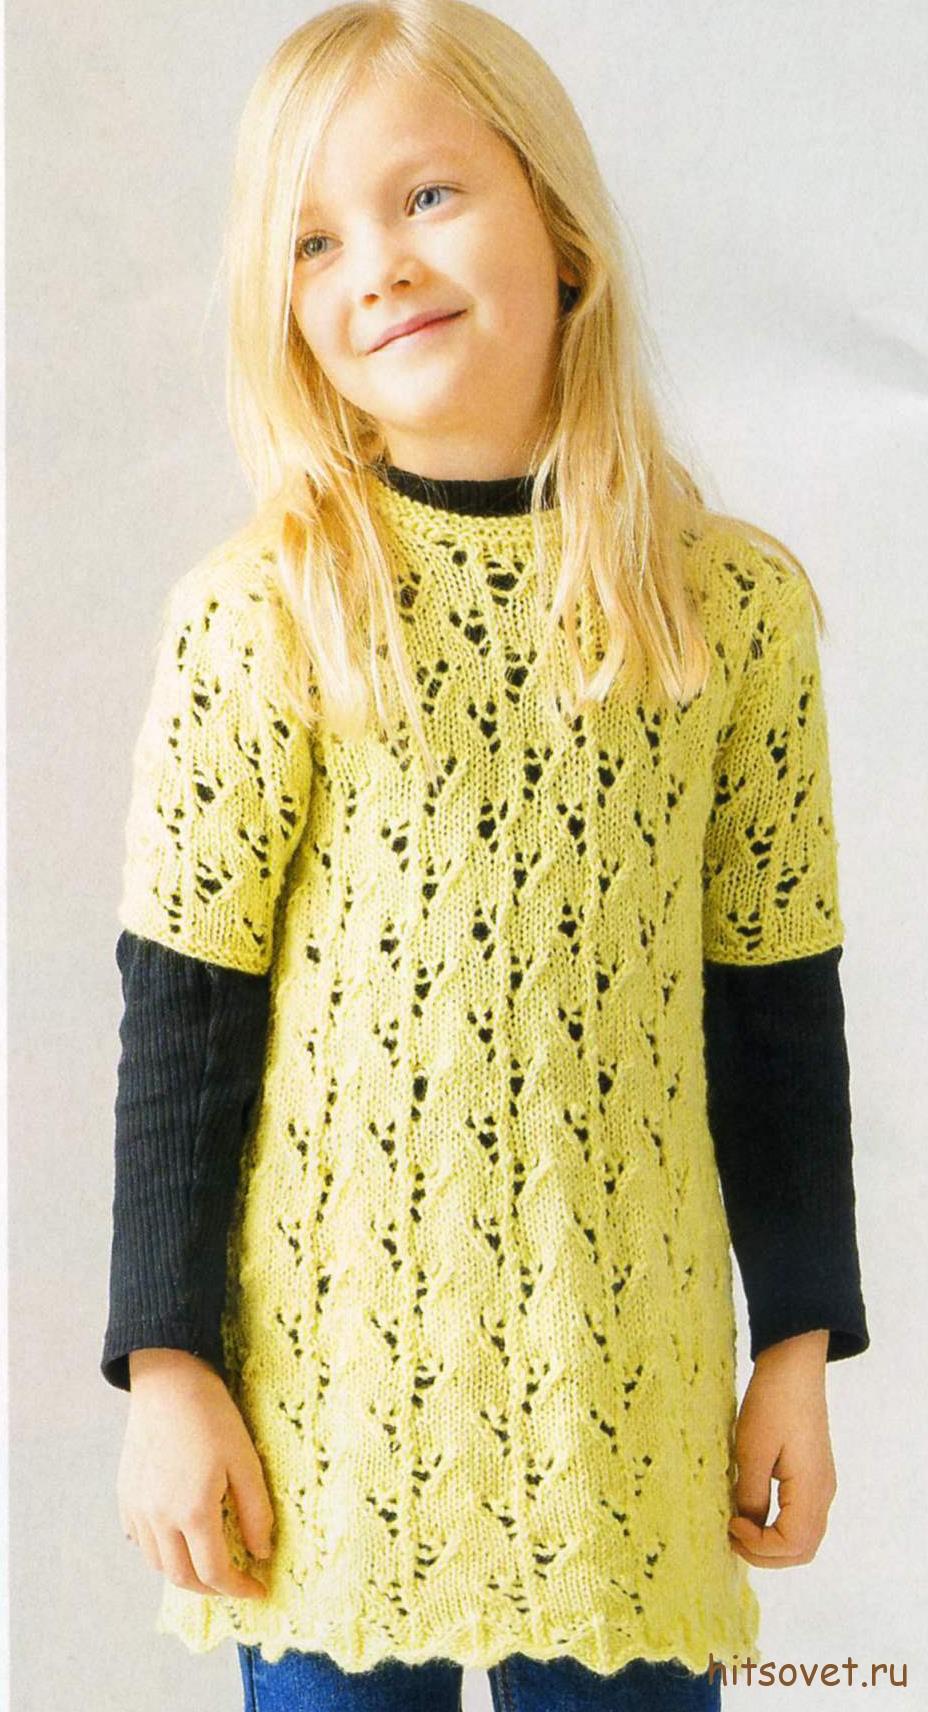 Желтая туника для девочки спицами